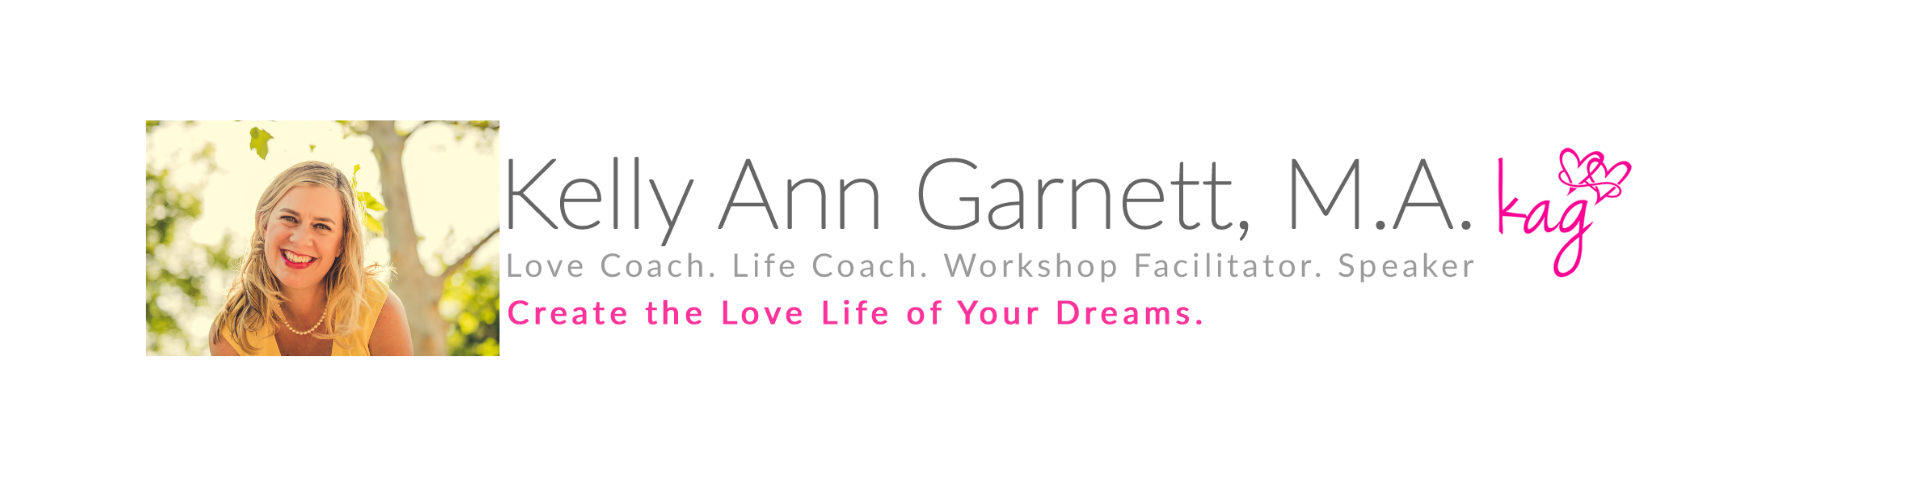 Kelly Ann Garnett, M.A.